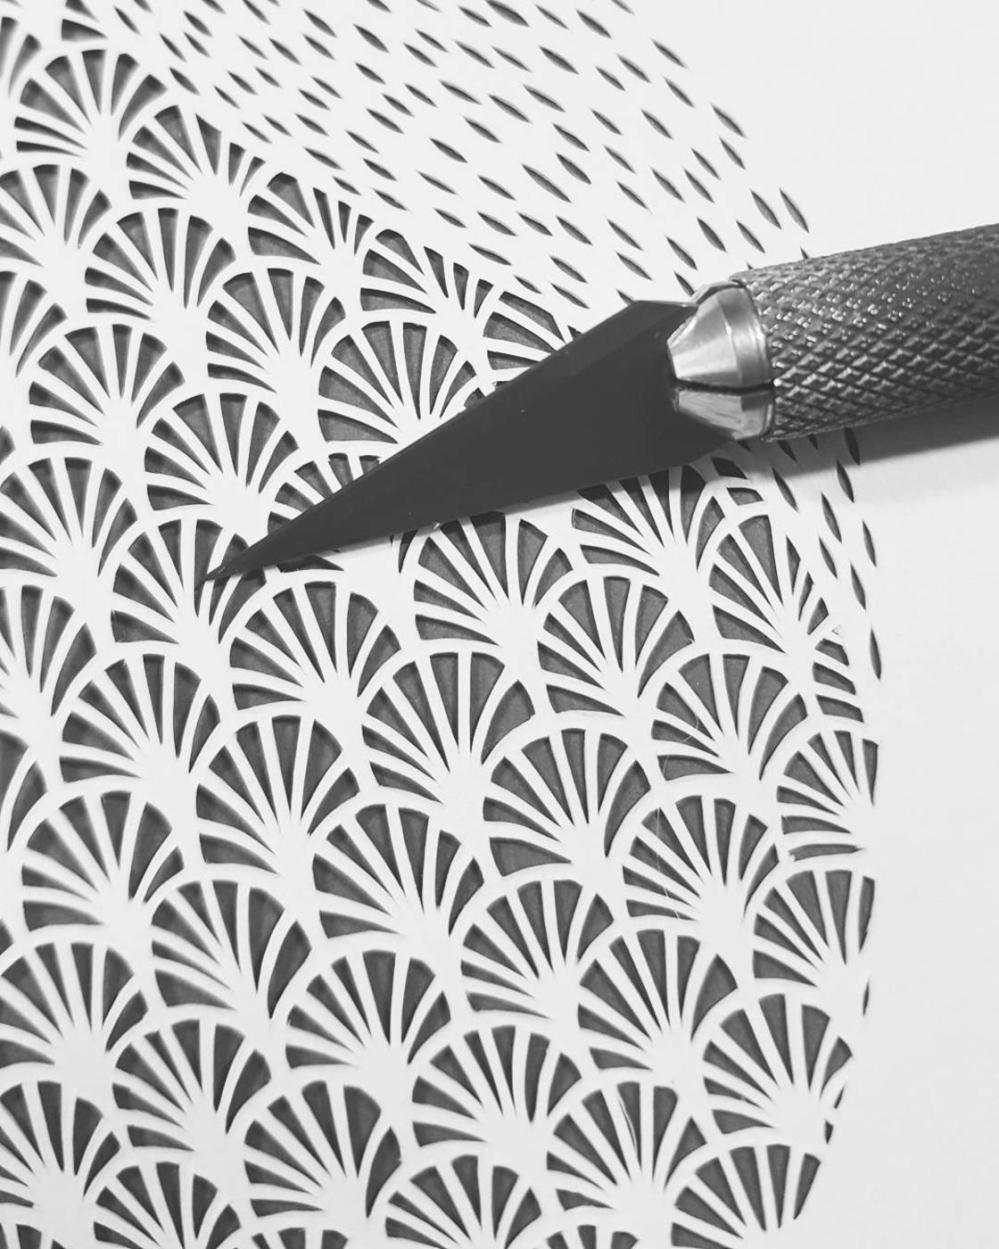 papercut-art-pippa-dyrlaga-21